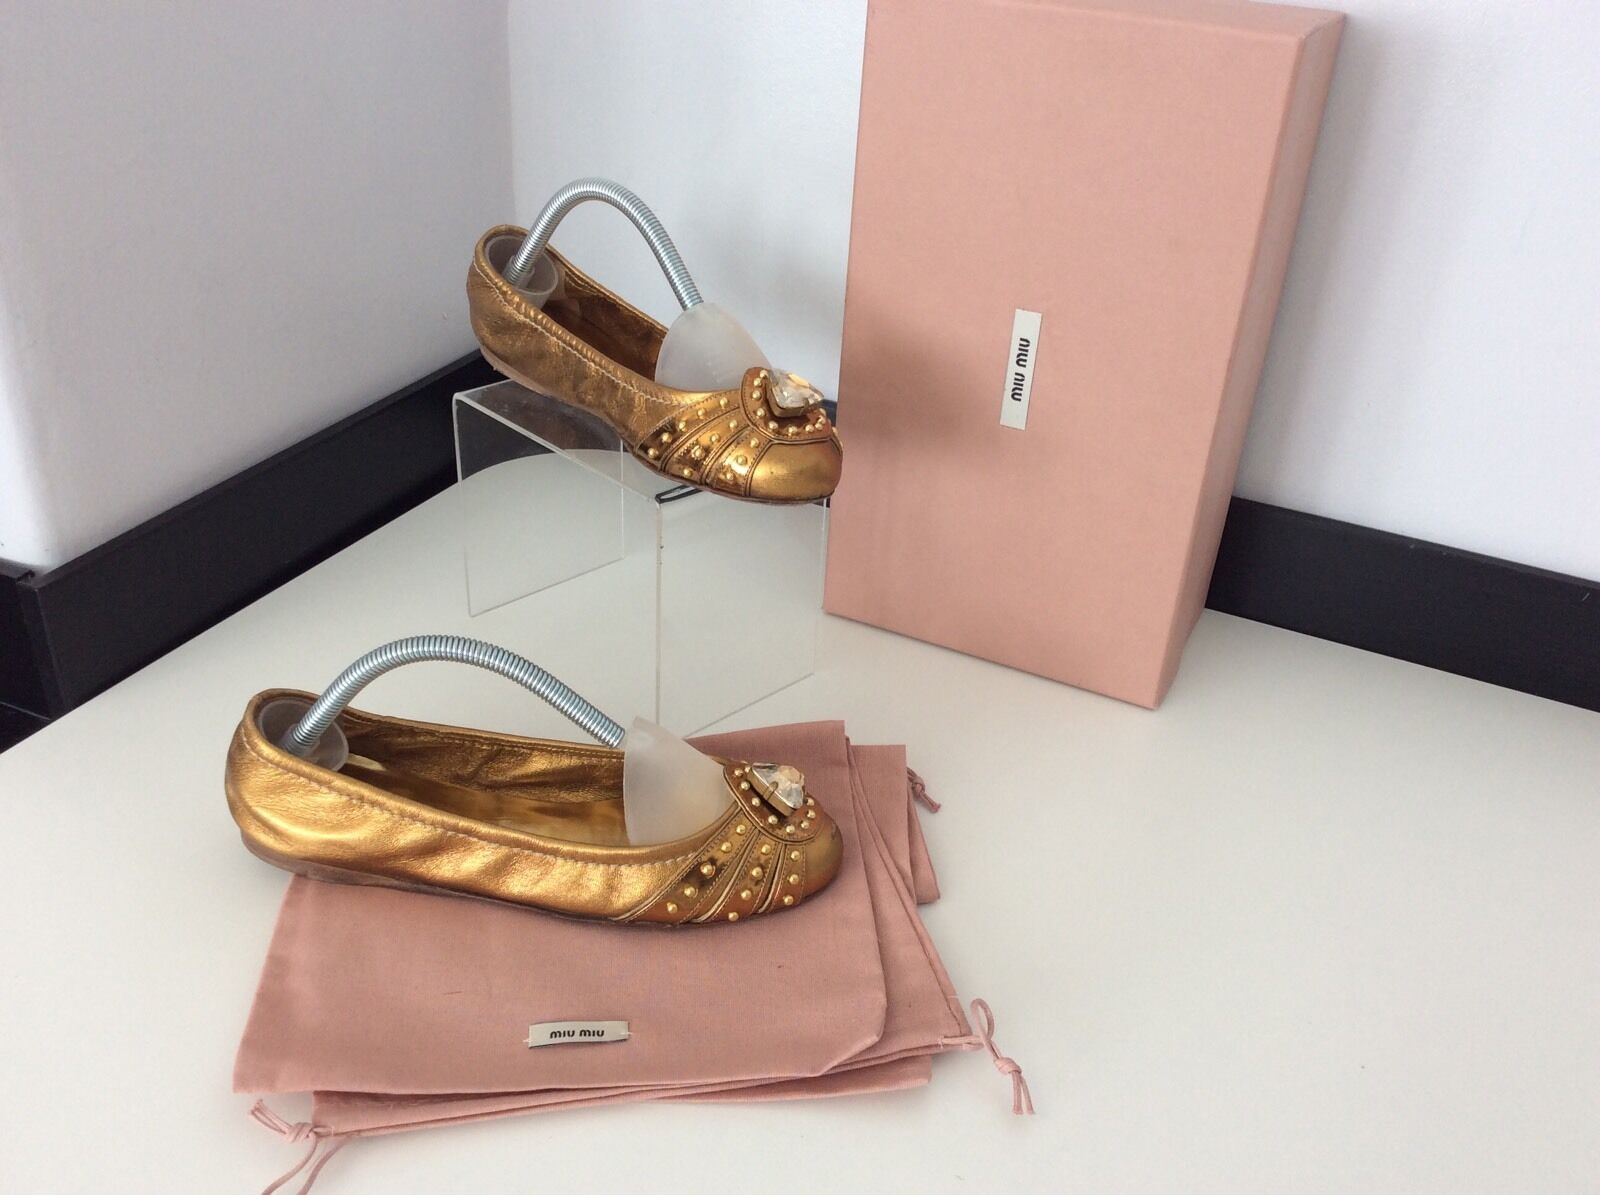 Miu miu Bronze Gold  Ballerina Schuhes Flats Größe 35 Uk 2.5 Boxed Dust Bags Vgc